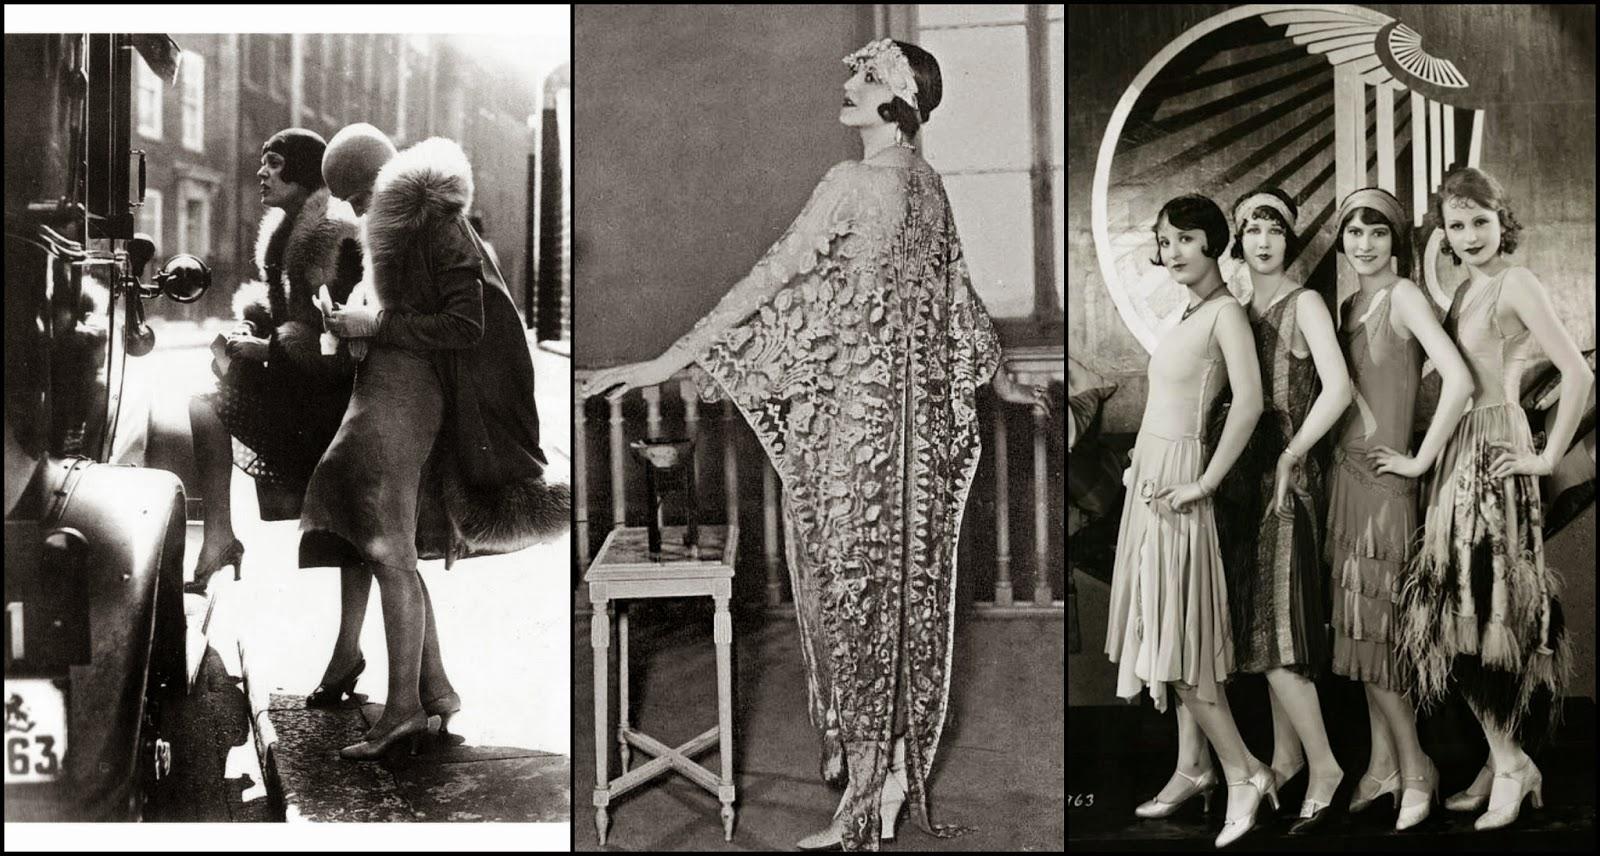 a8d509c00e6 Η εξέλιξη της μόδας από το 1900 έως και σήμερα μέσα από φωτογραφίες και  βίντεο!